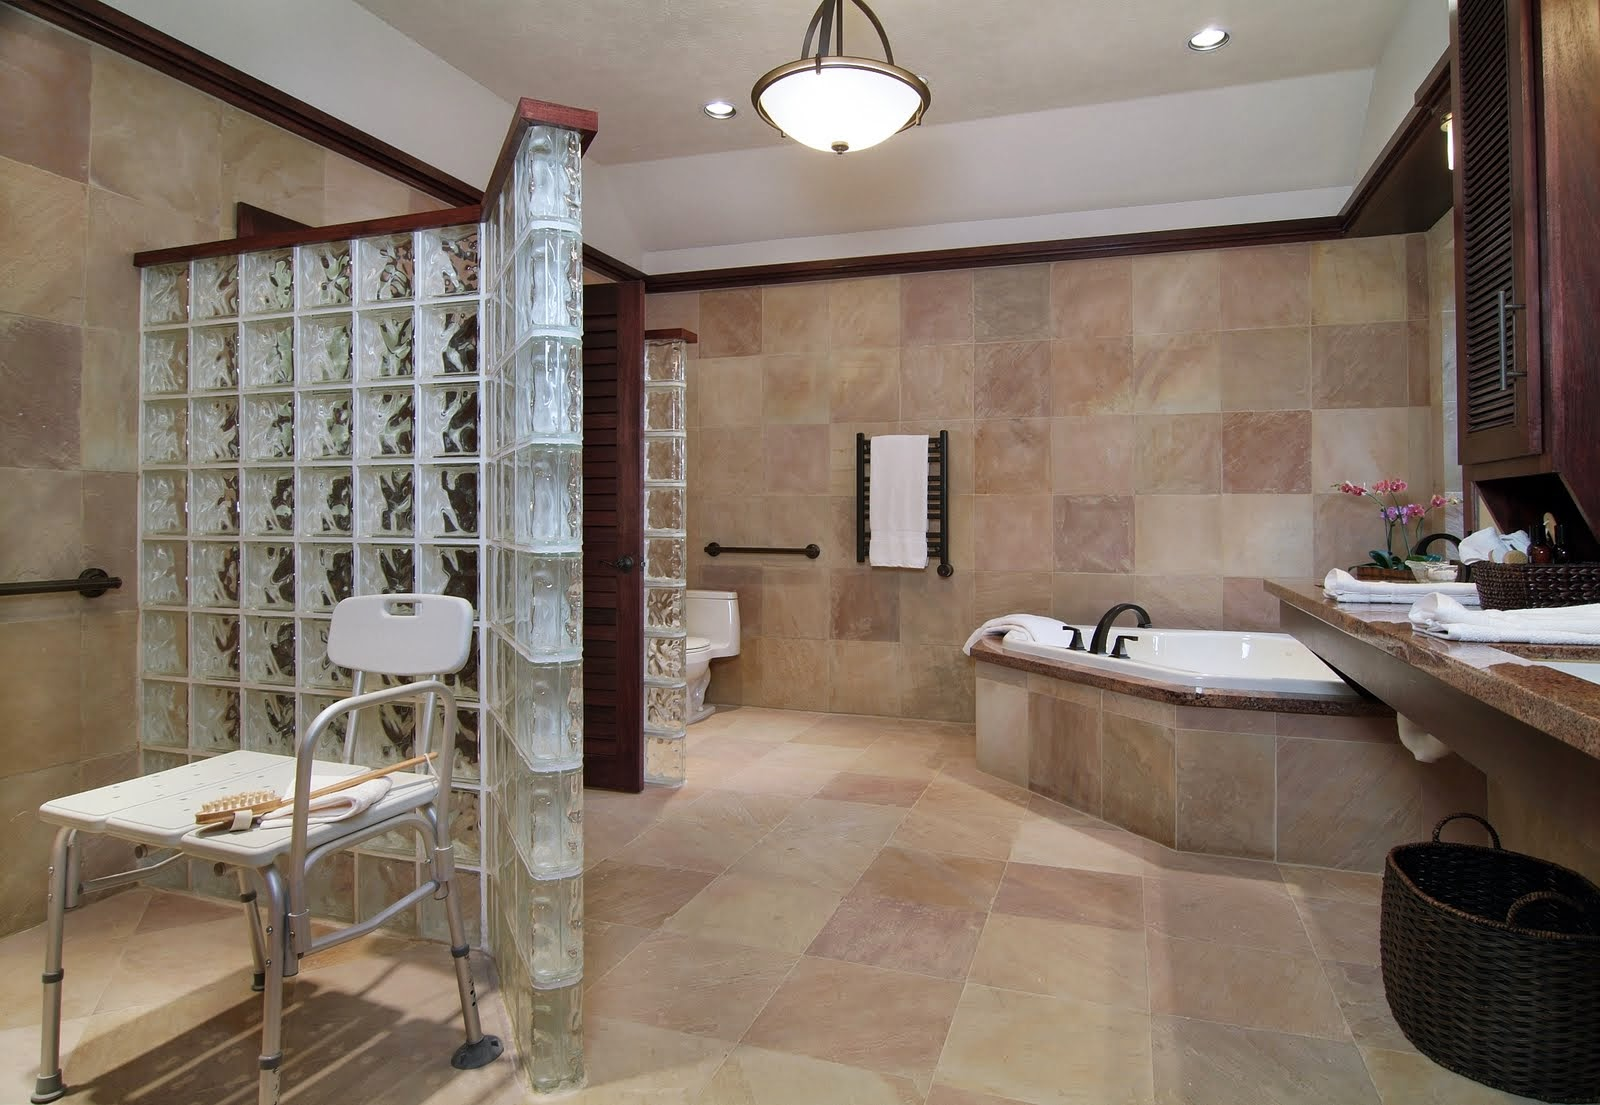 3150 صور حمامات ديكورات و حوائط و تصاميم واكسسوارات حمامات بمساحات كبيرة